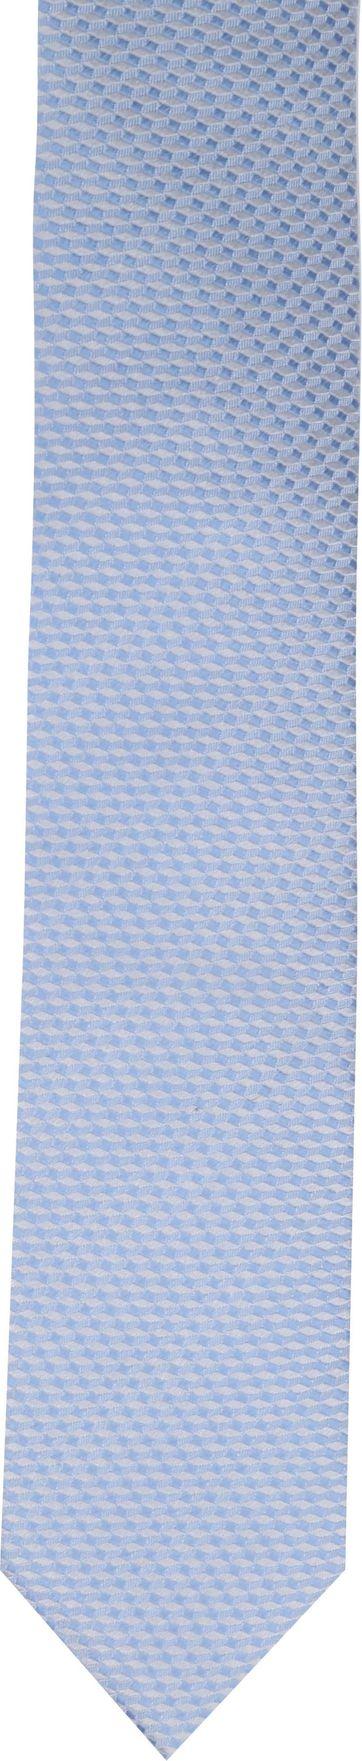 Suitable Krawatte Hellblau F01-37